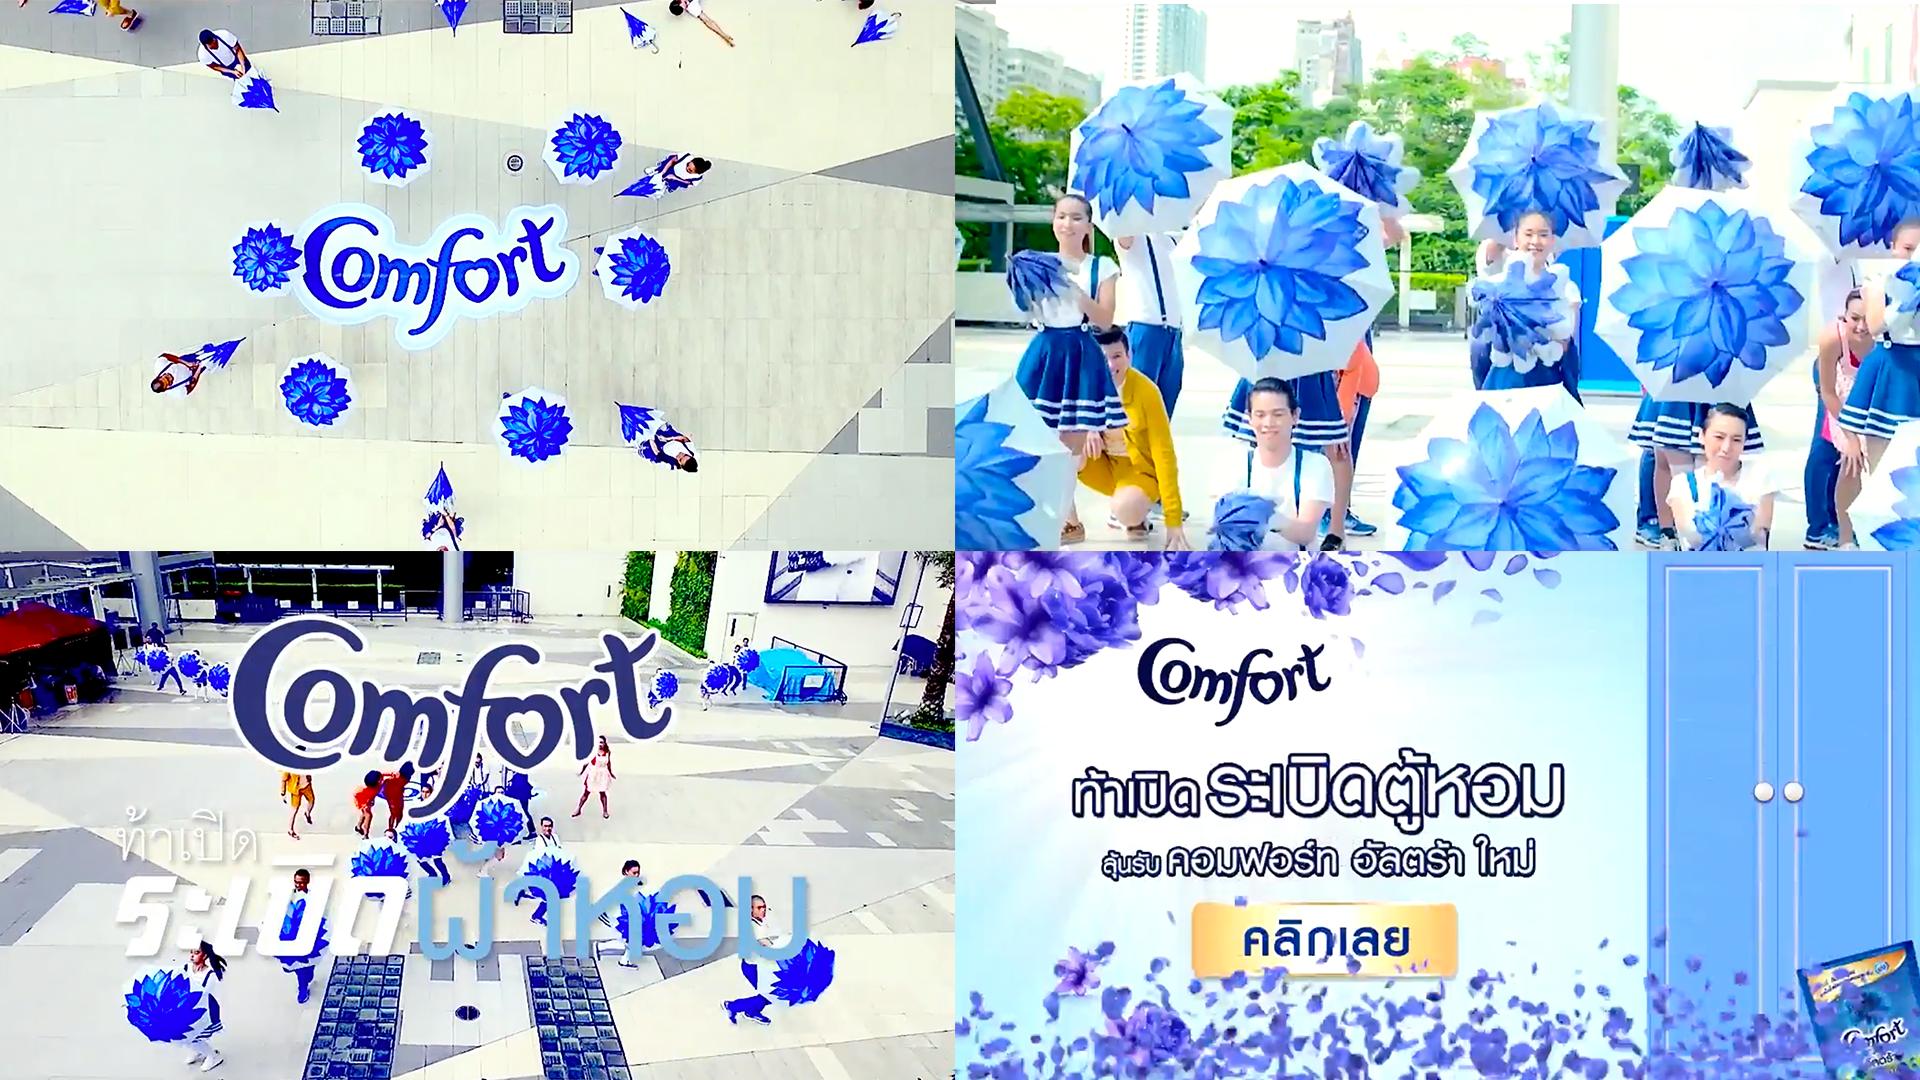 Comfort Thailand